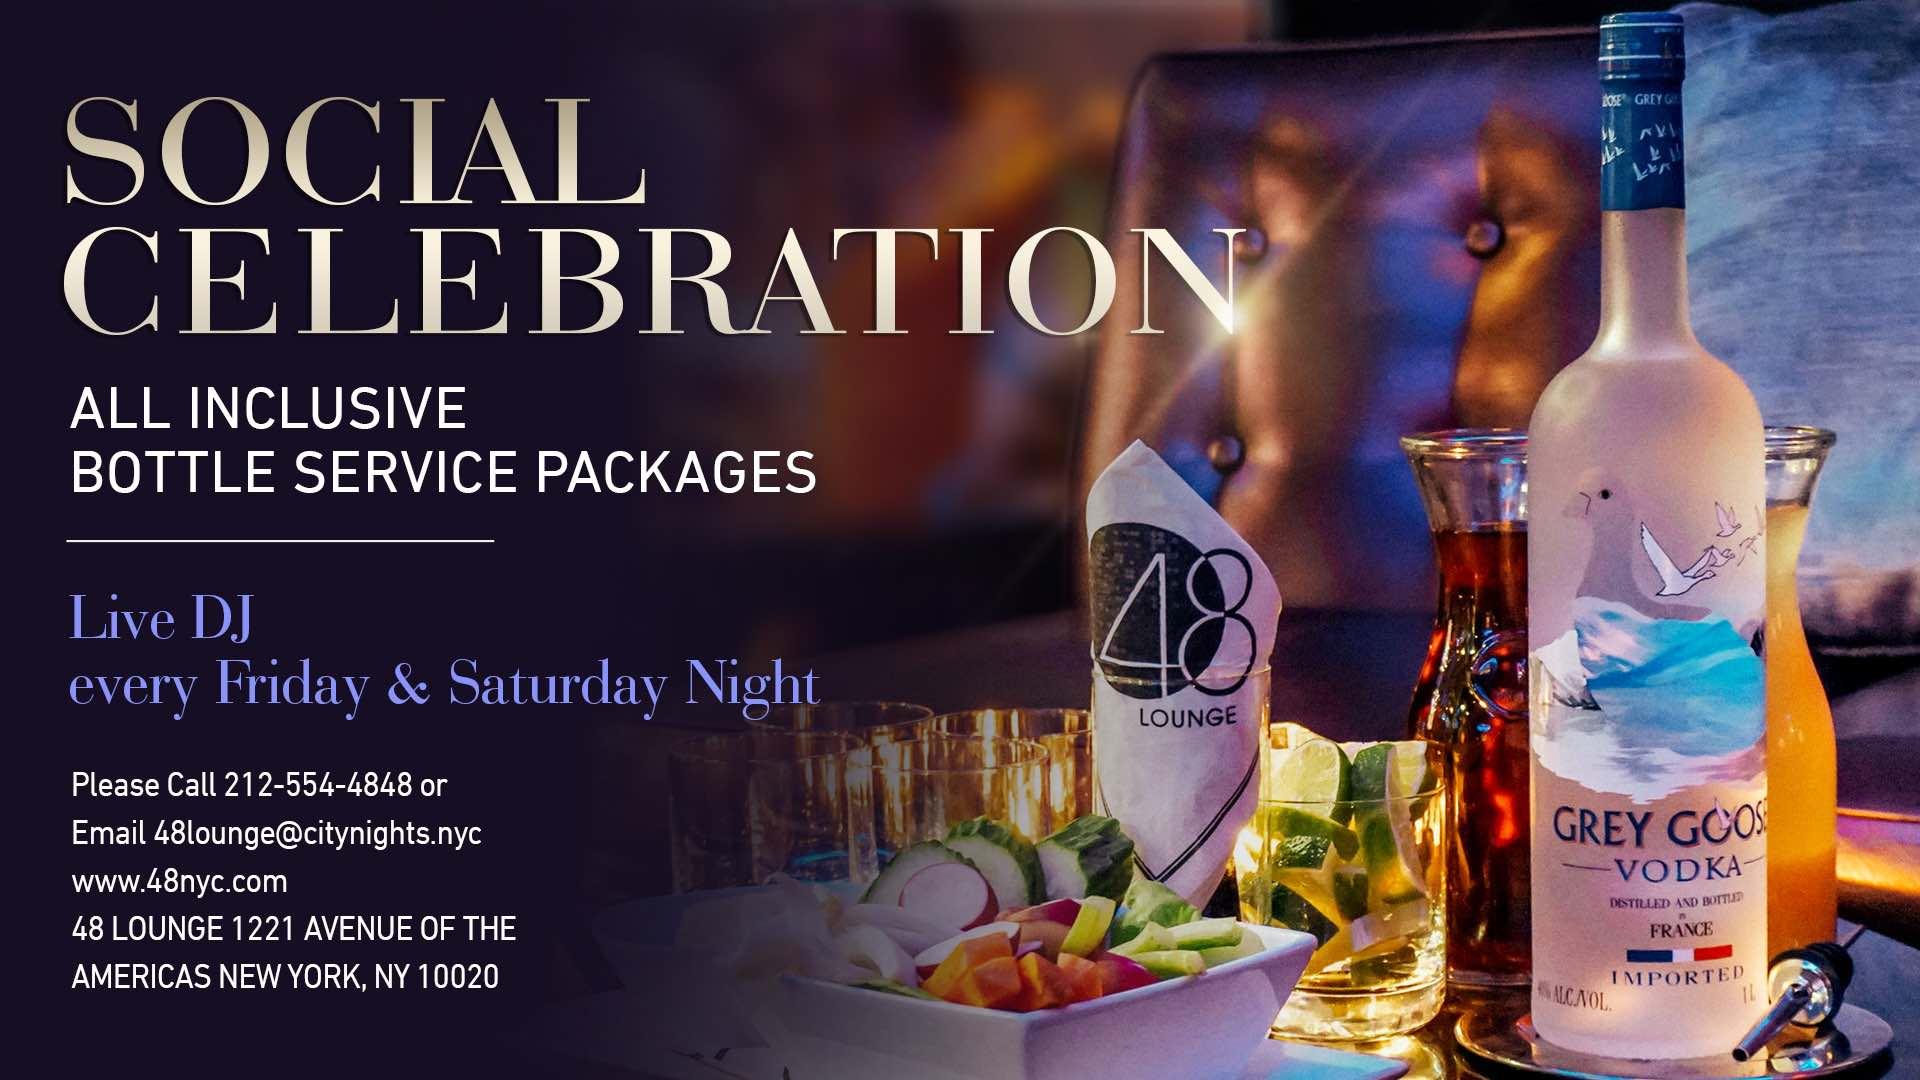 Social Celebration Bottle Service